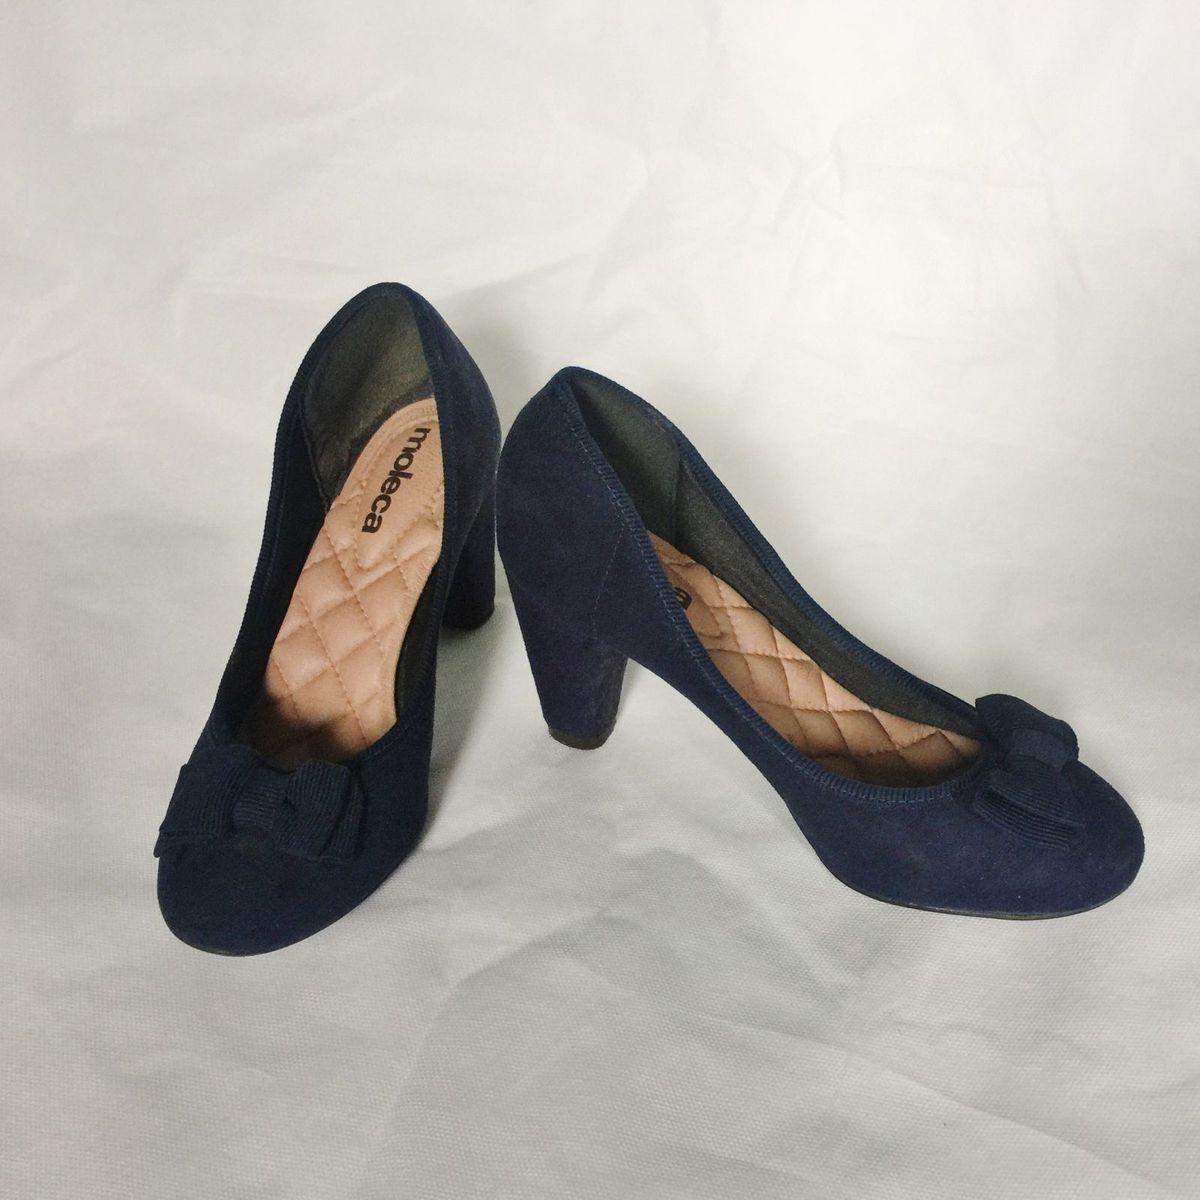 edc7ddcc54296 conforto é tudo! - sapatos moleca.  Czm6ly9wag90b3muzw5qb2vplmnvbs5ici9wcm9kdwn0cy82mjyynzuzlzvkndfkndmymtdlytjjmmfiotq4mjhiogyynmmwywvllmpwzw